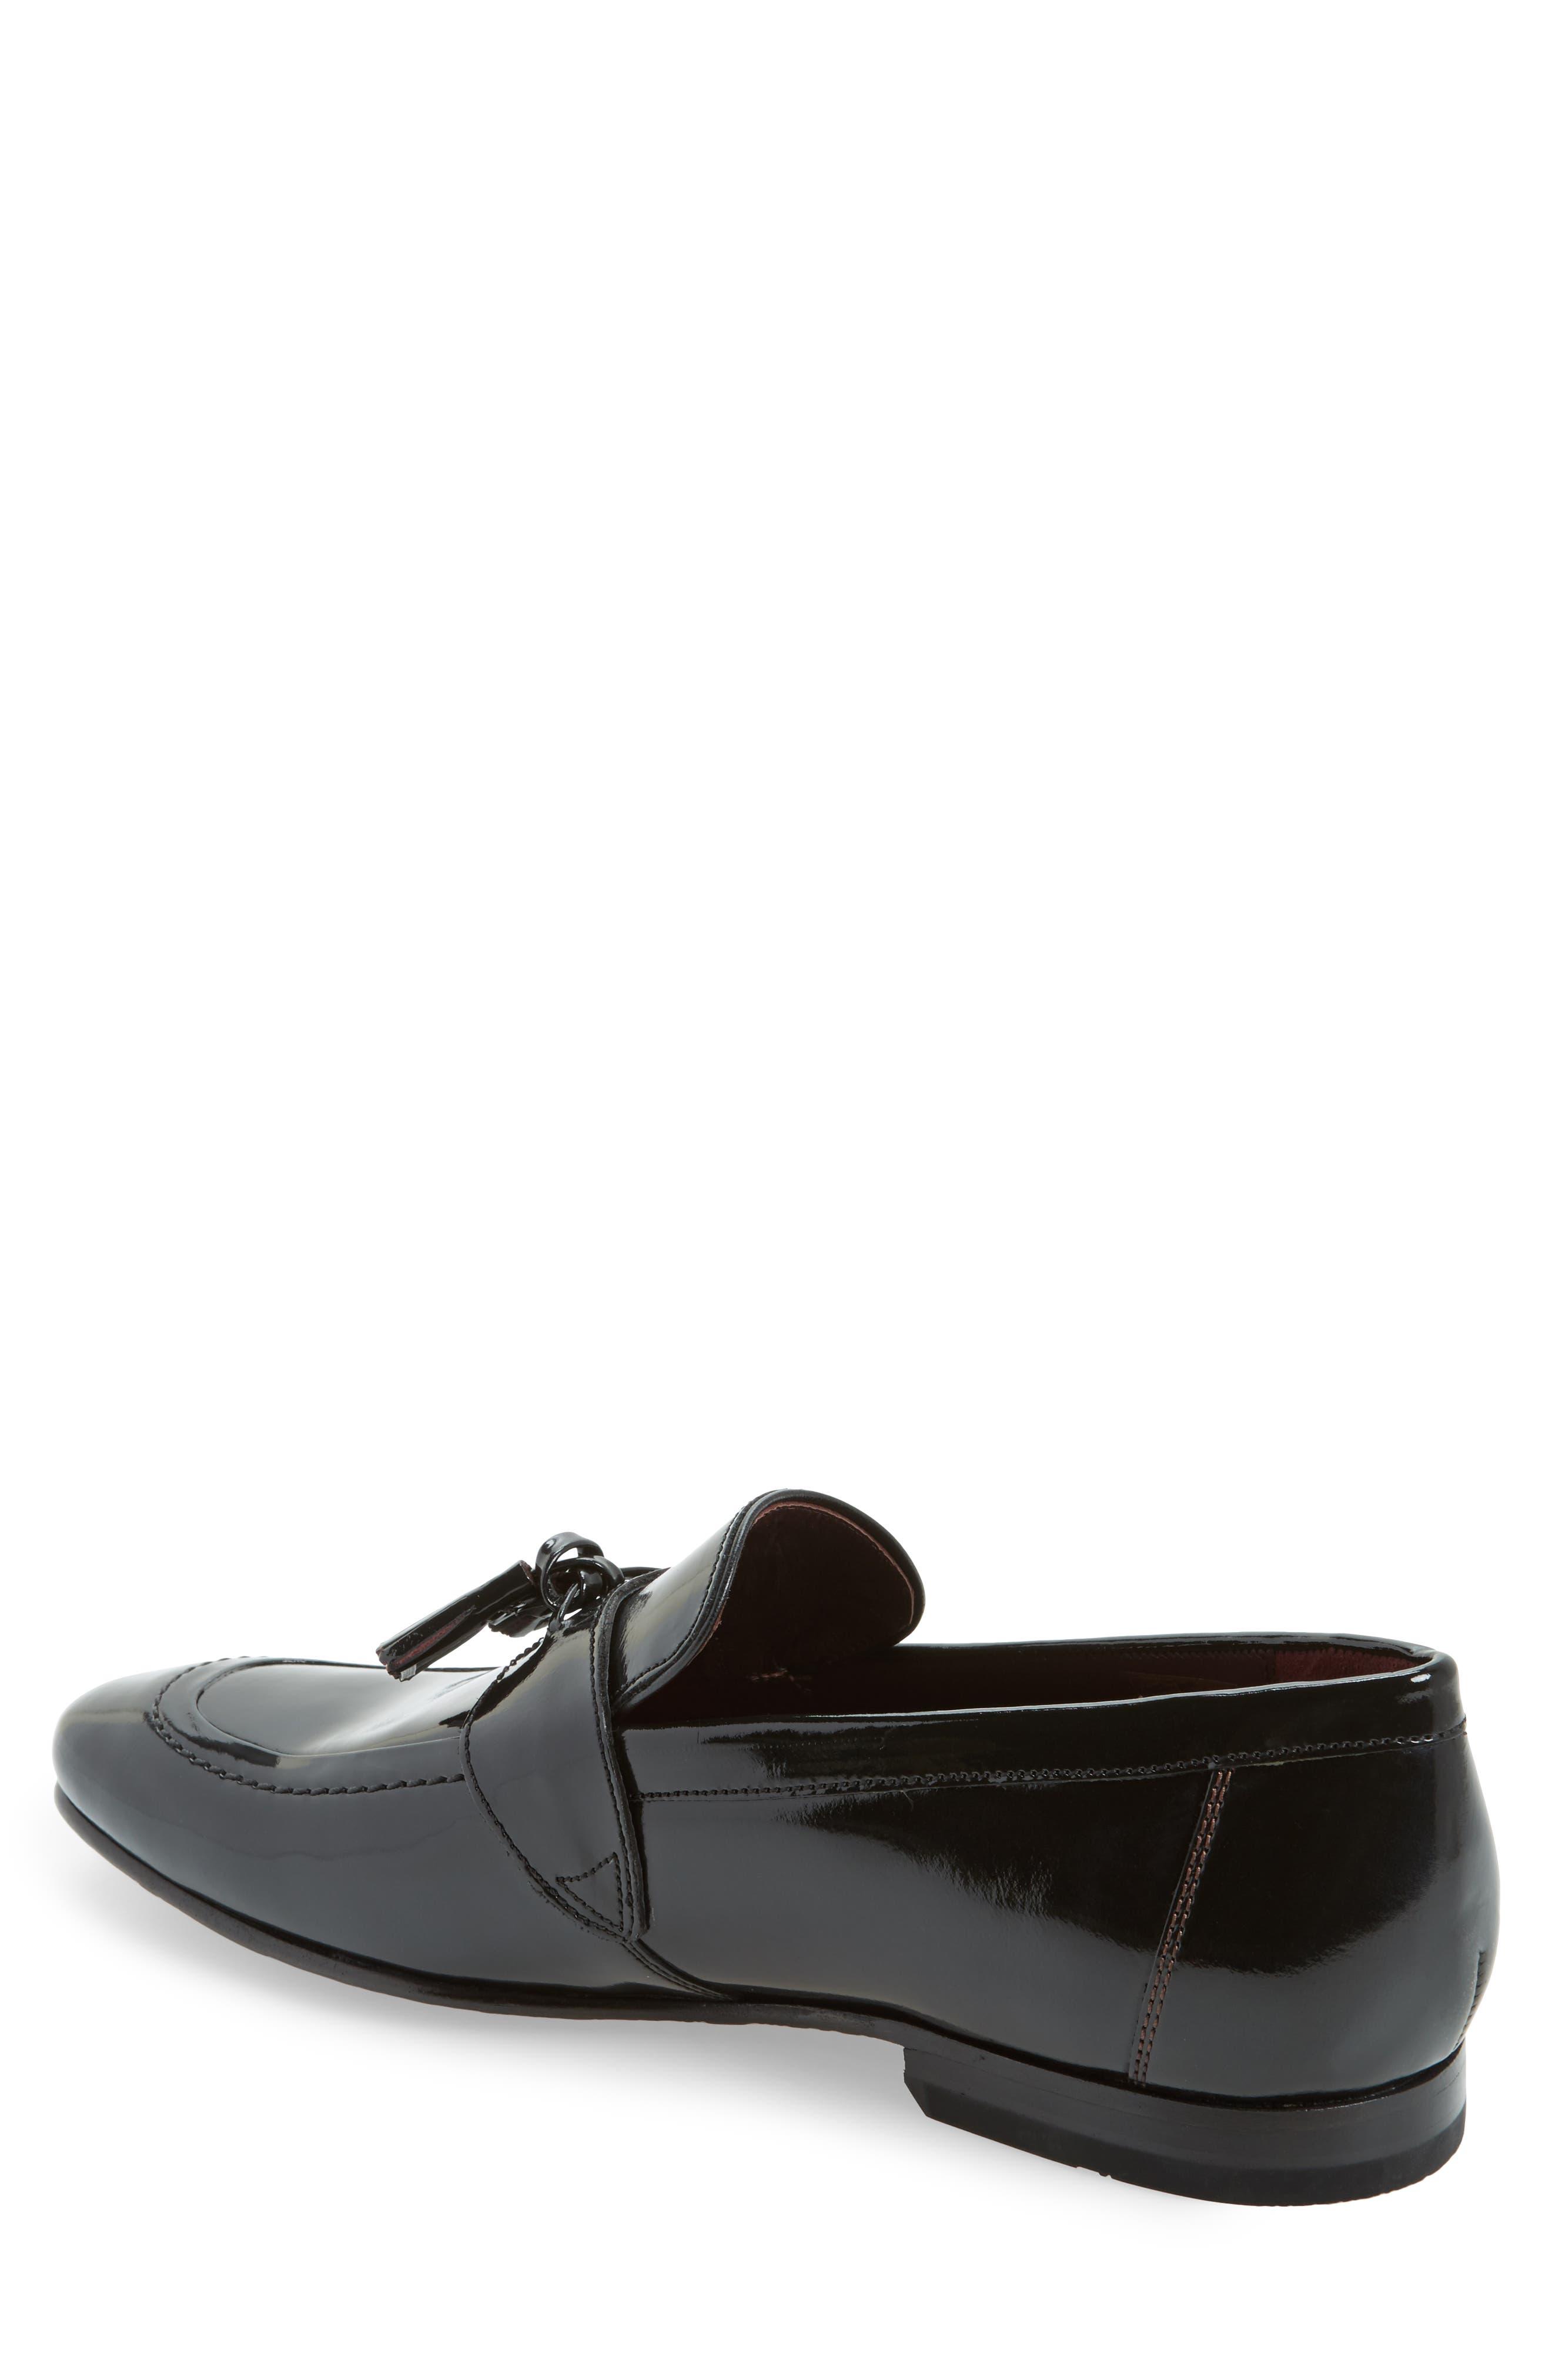 Grafit Tassel Loafer,                             Alternate thumbnail 2, color,                             Black Patent Leather